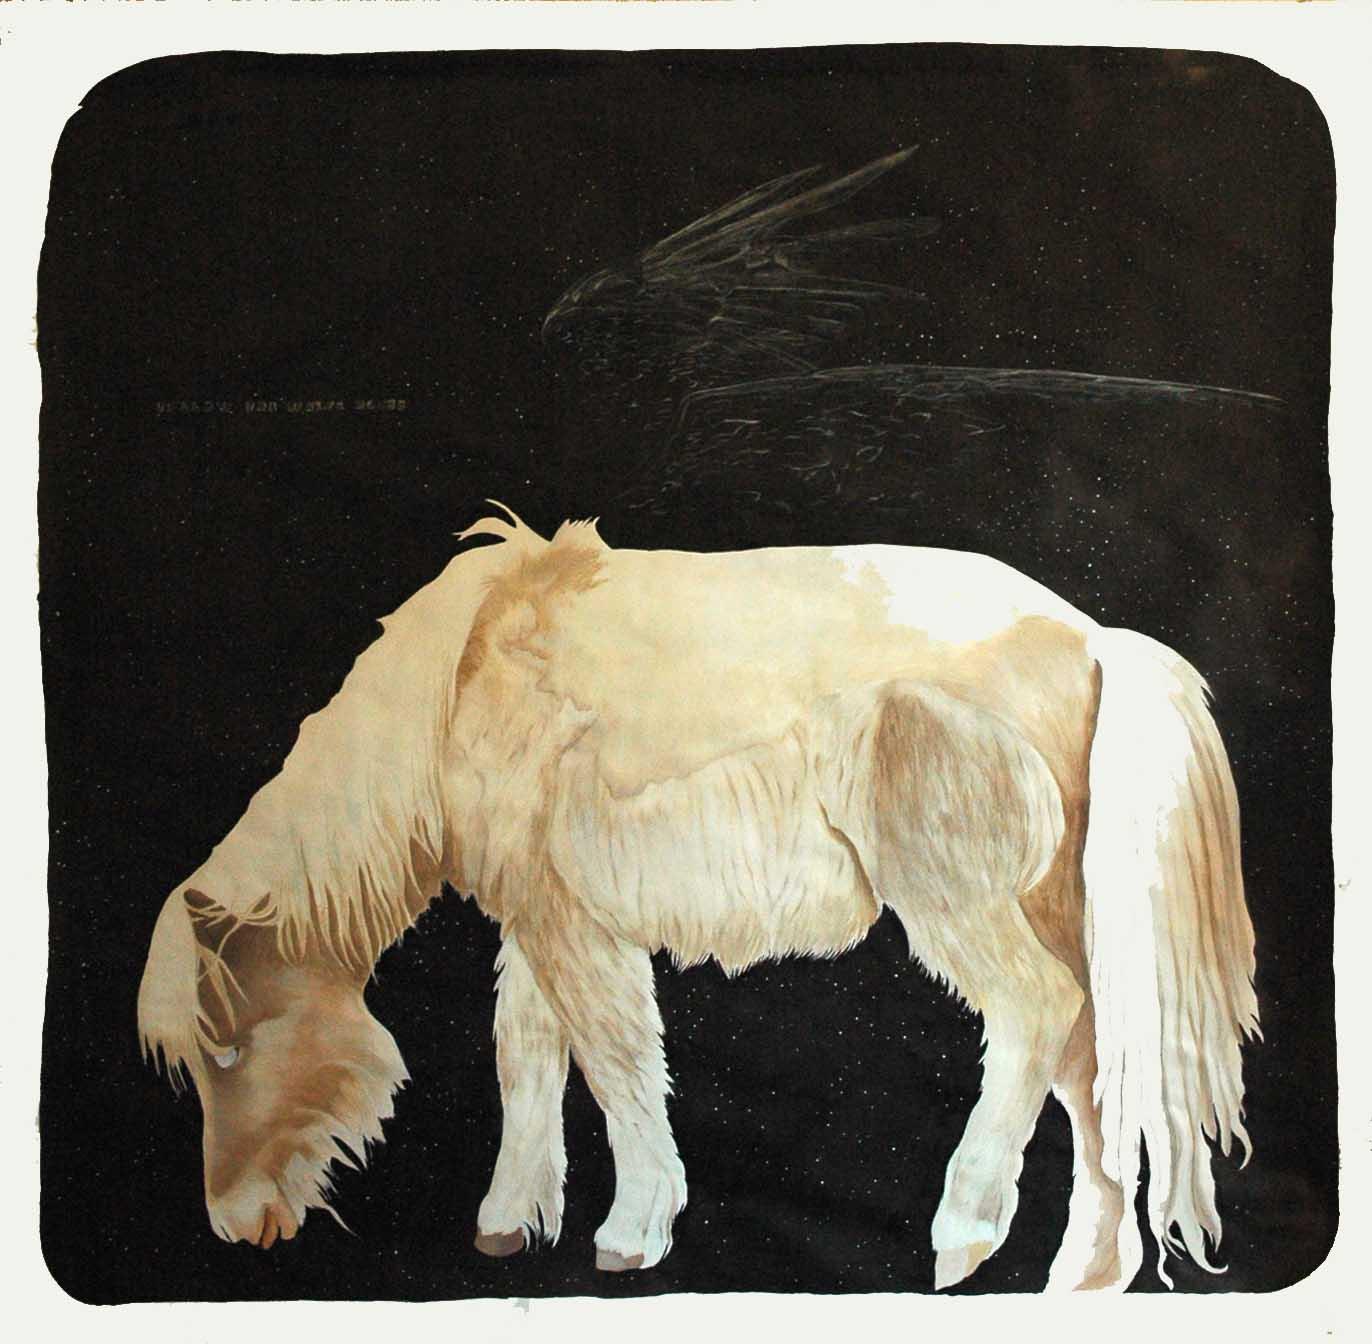 Follow_the_white_horse